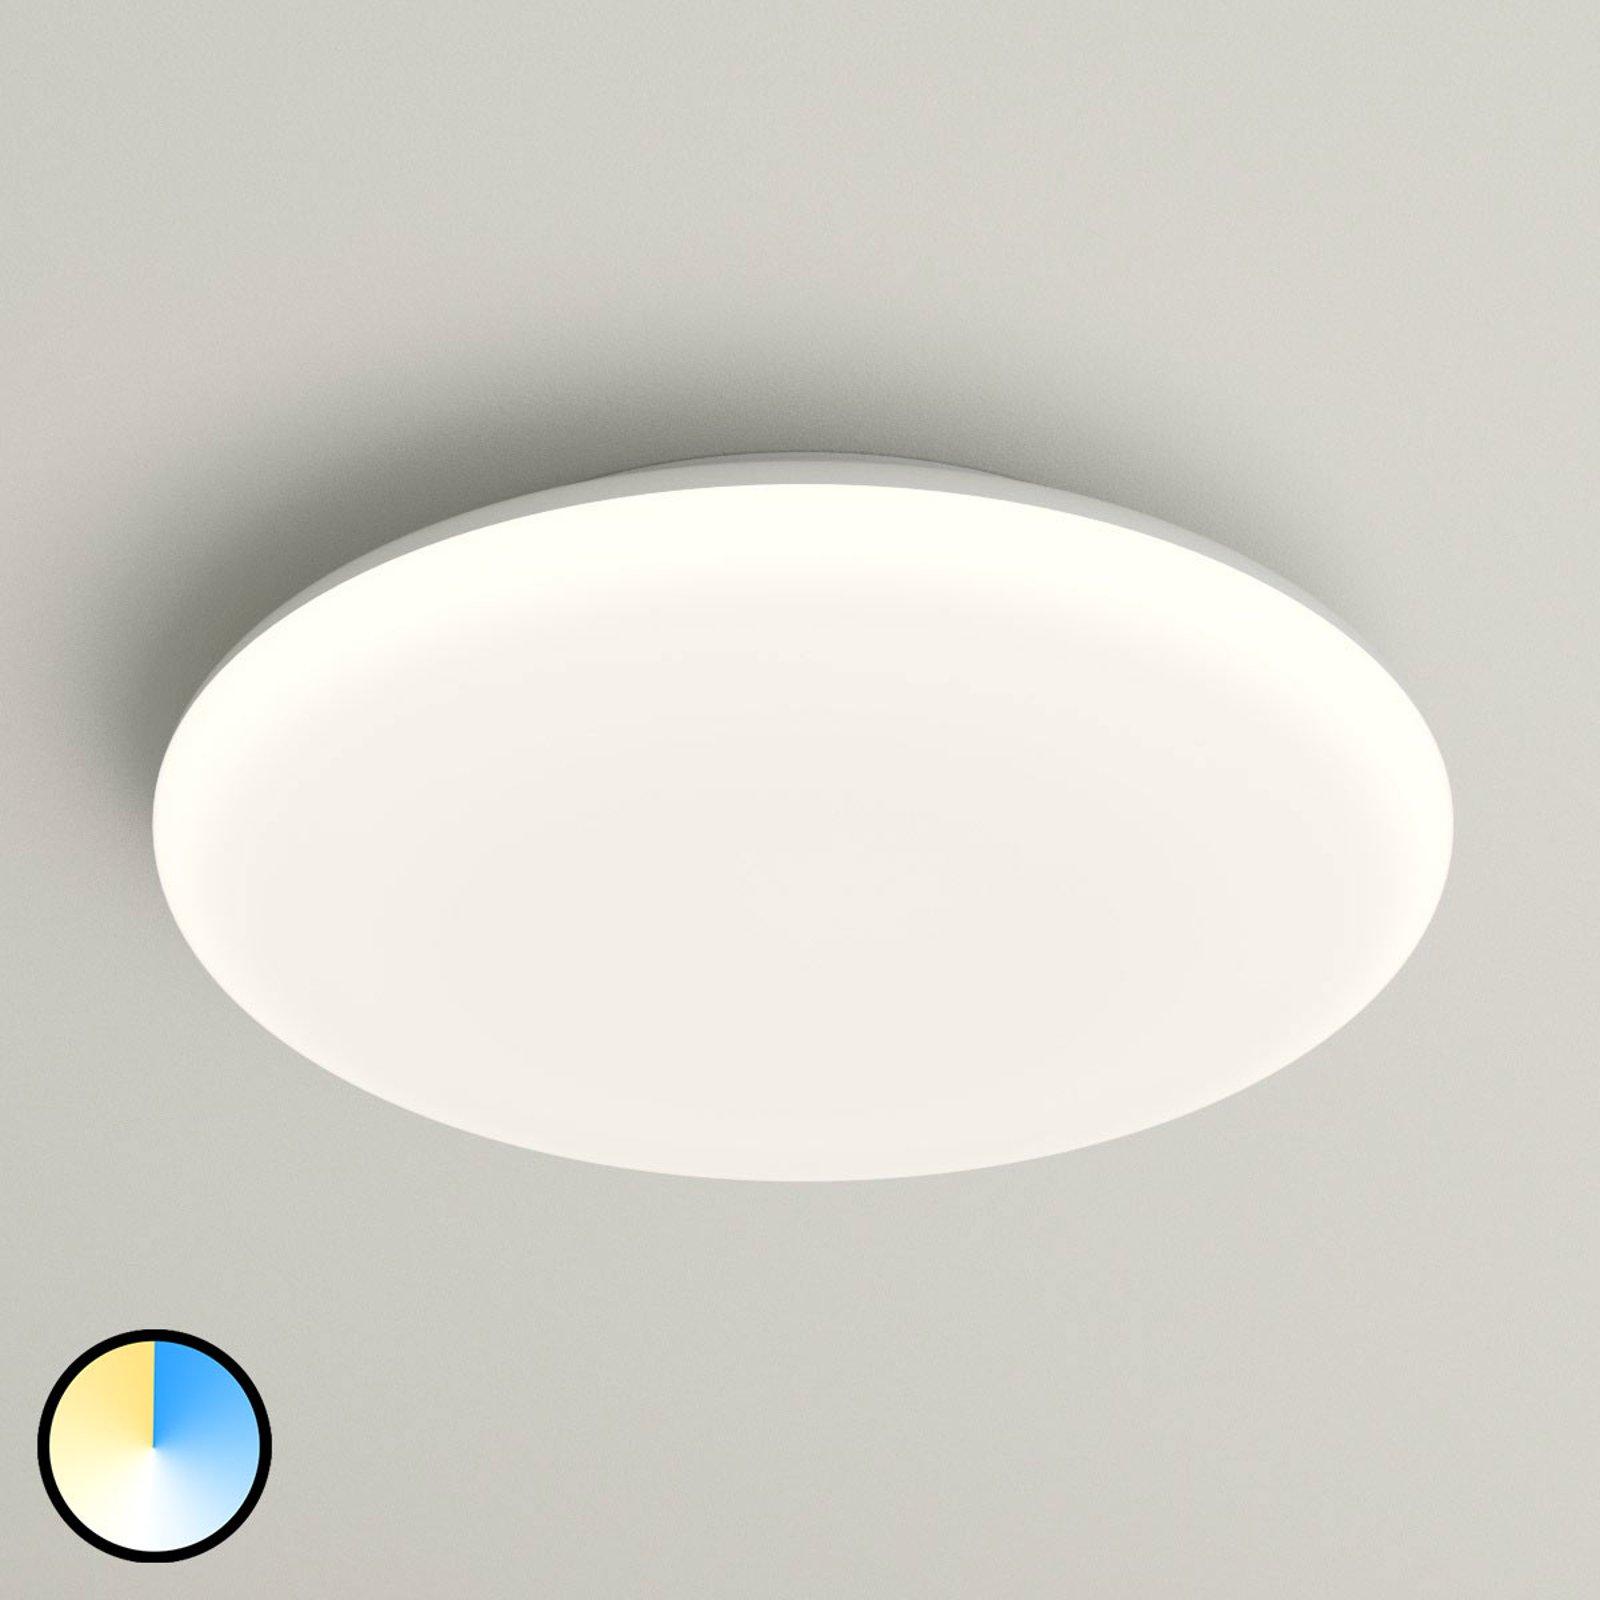 LED-taklampe Azra, hvit, rund IP54, 30 cm diameter